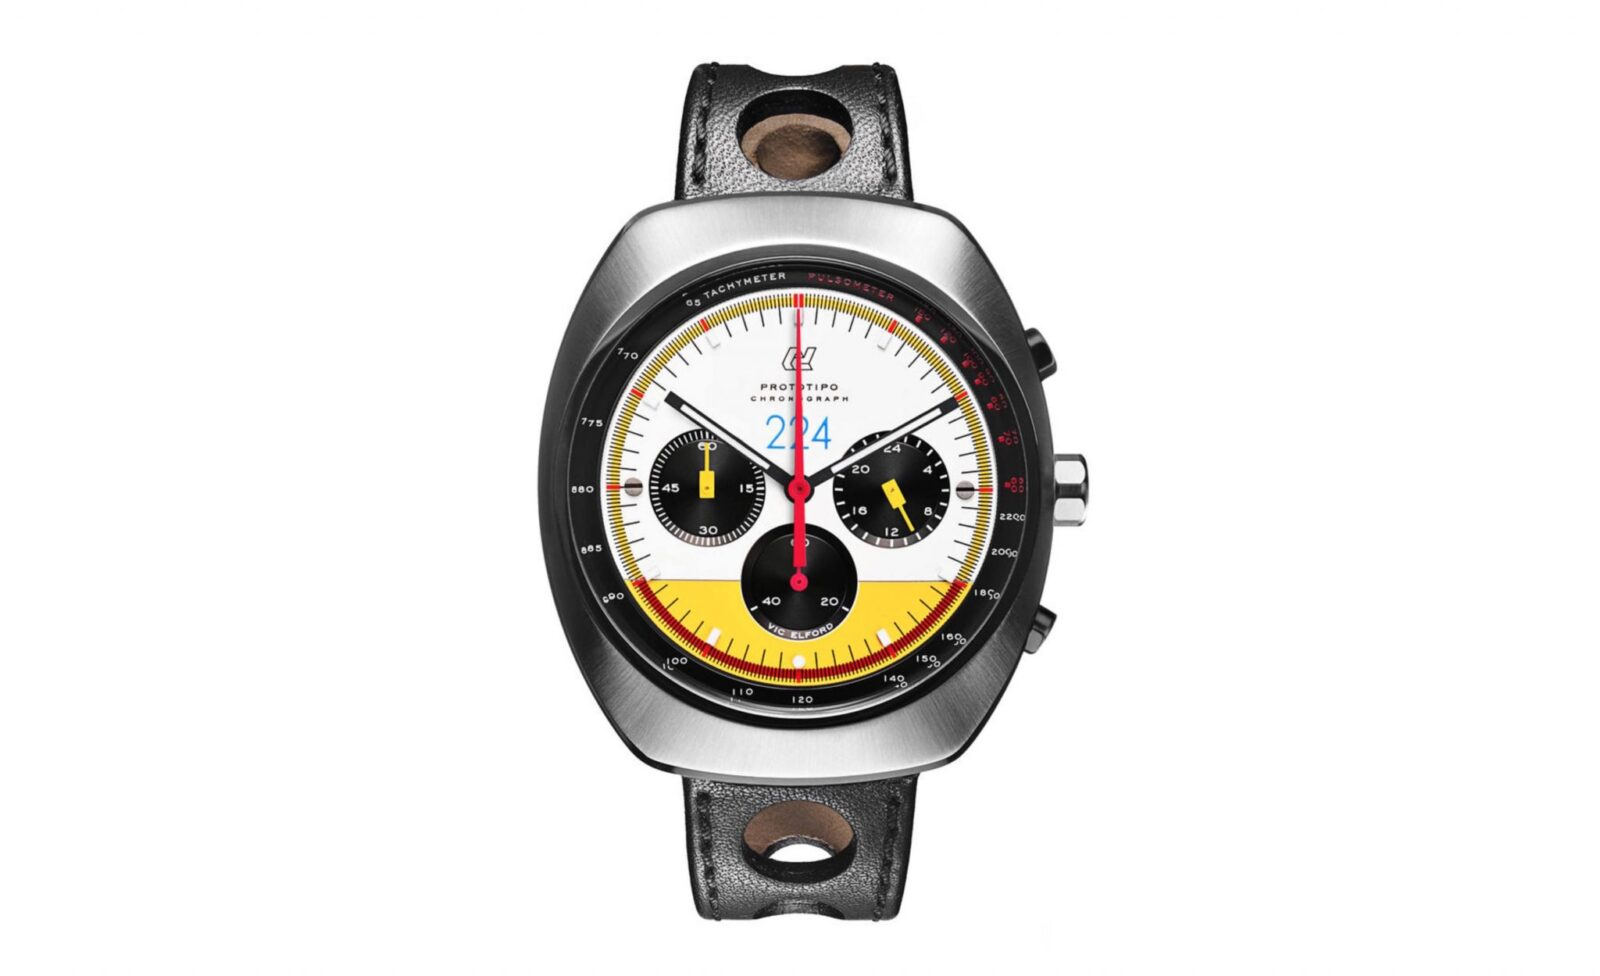 Autodromo Watch 1600x976 - Vic Elford Prototipo Chronograph by Autodromo